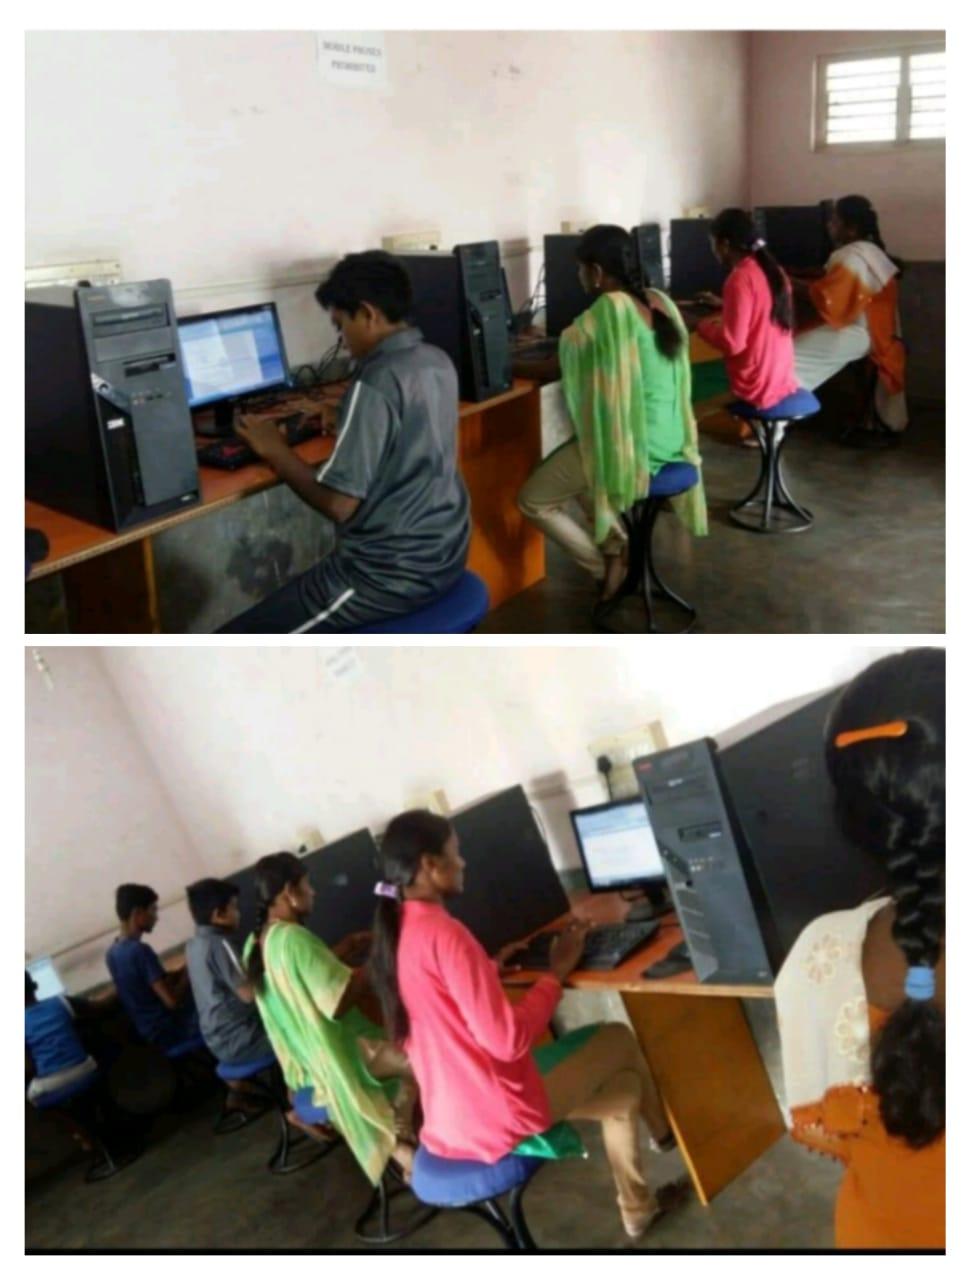 /media/burds/1NGO-00306-Bharath_Urban_And_Rural_Development_Trust-Activities-Free_computer_training_class.jpeg